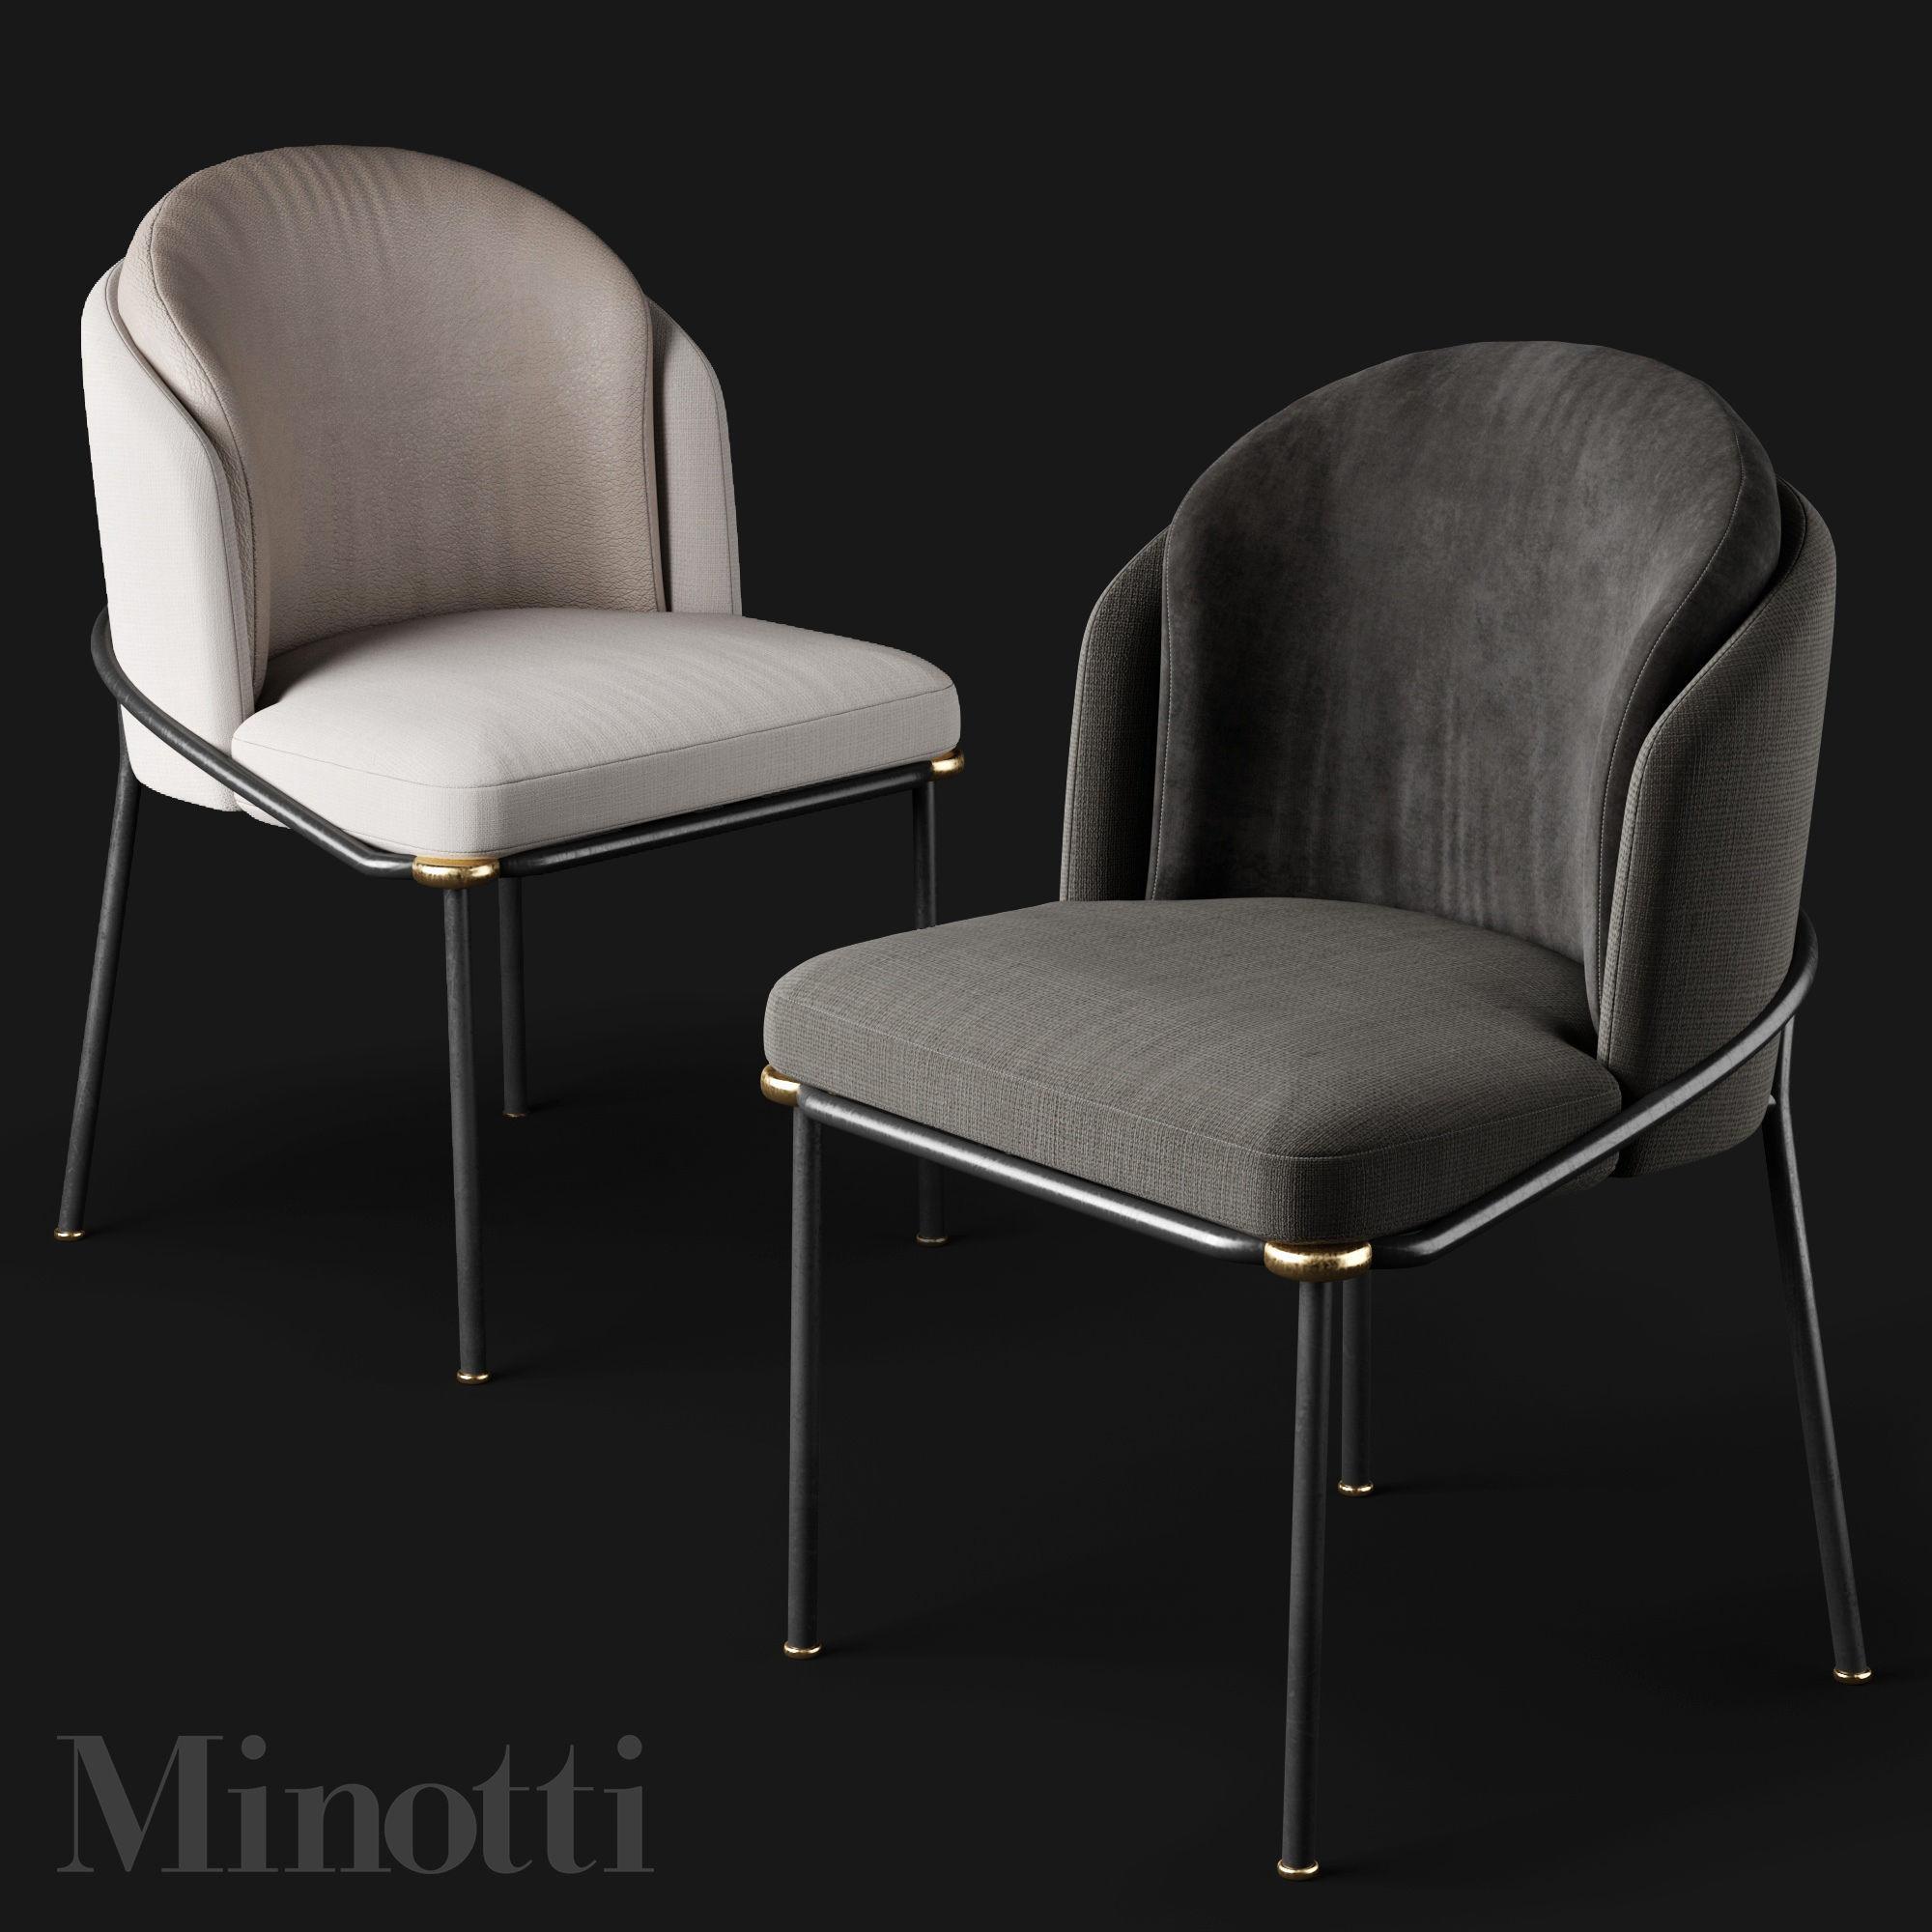 Dining Chairs Minotti Fil Noir Model